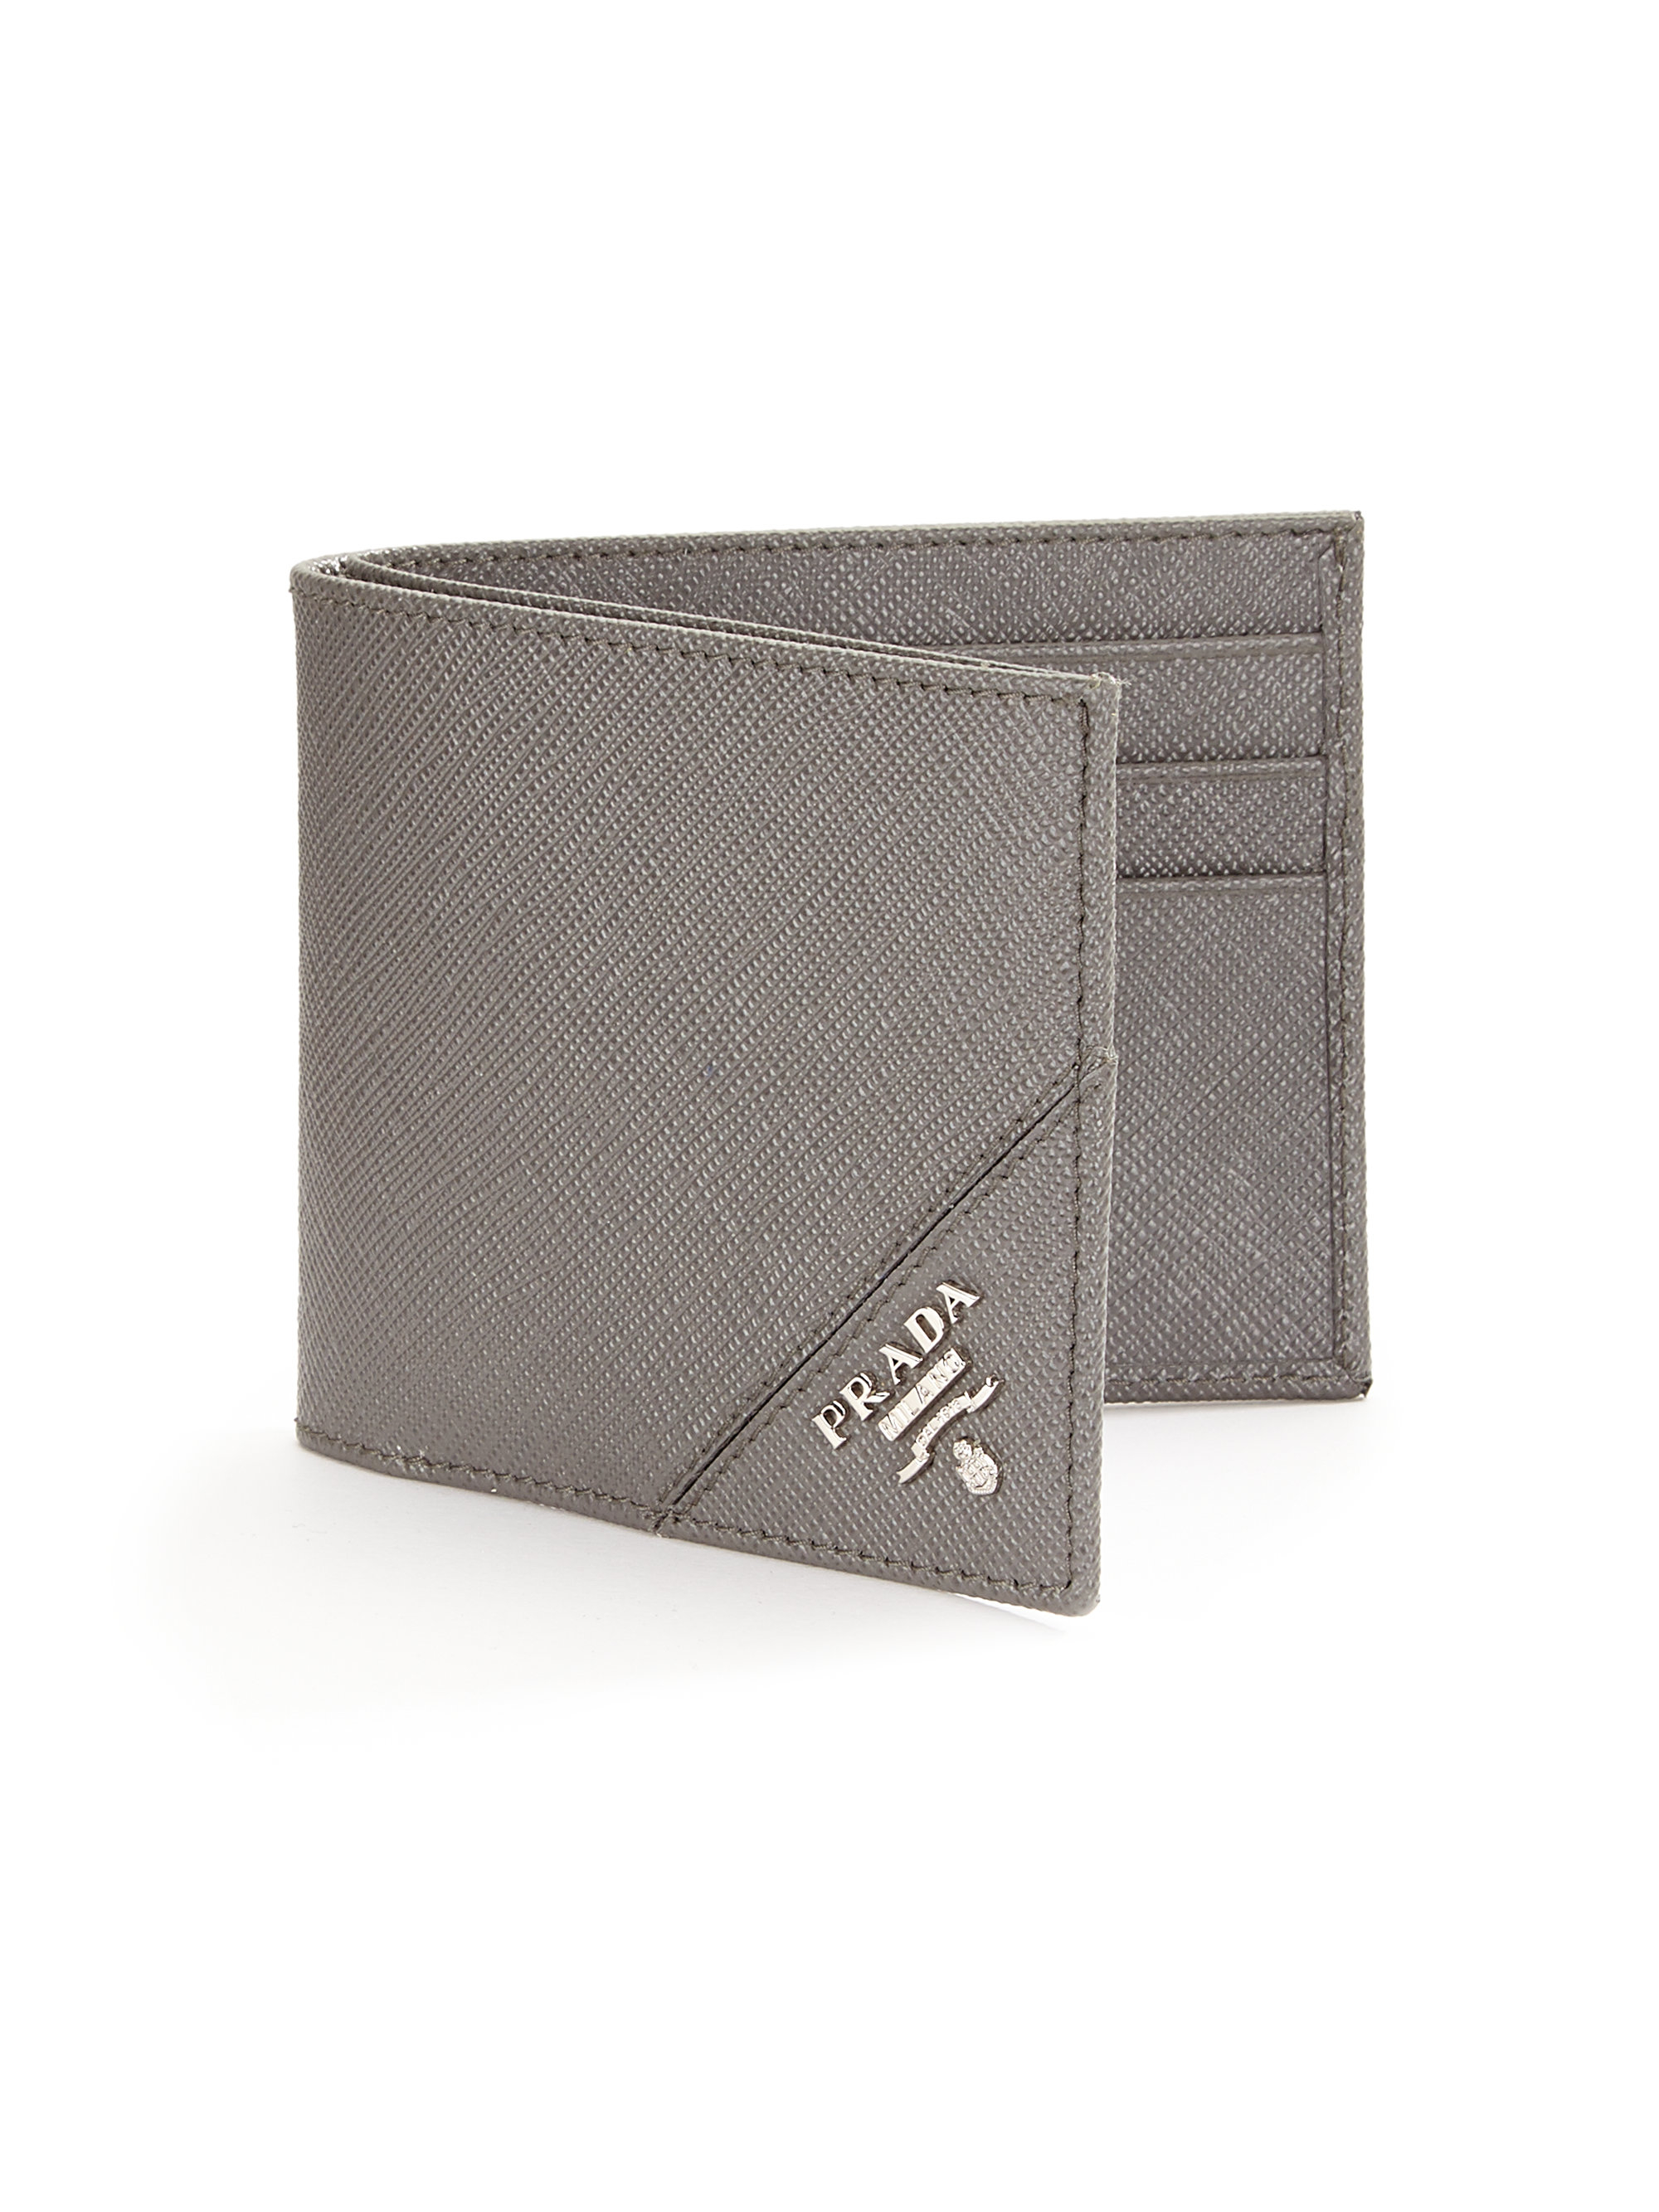 prada fringe clutch - prada-grey-orizzontale-wallet-gray-product-0-712795959-normal.jpeg